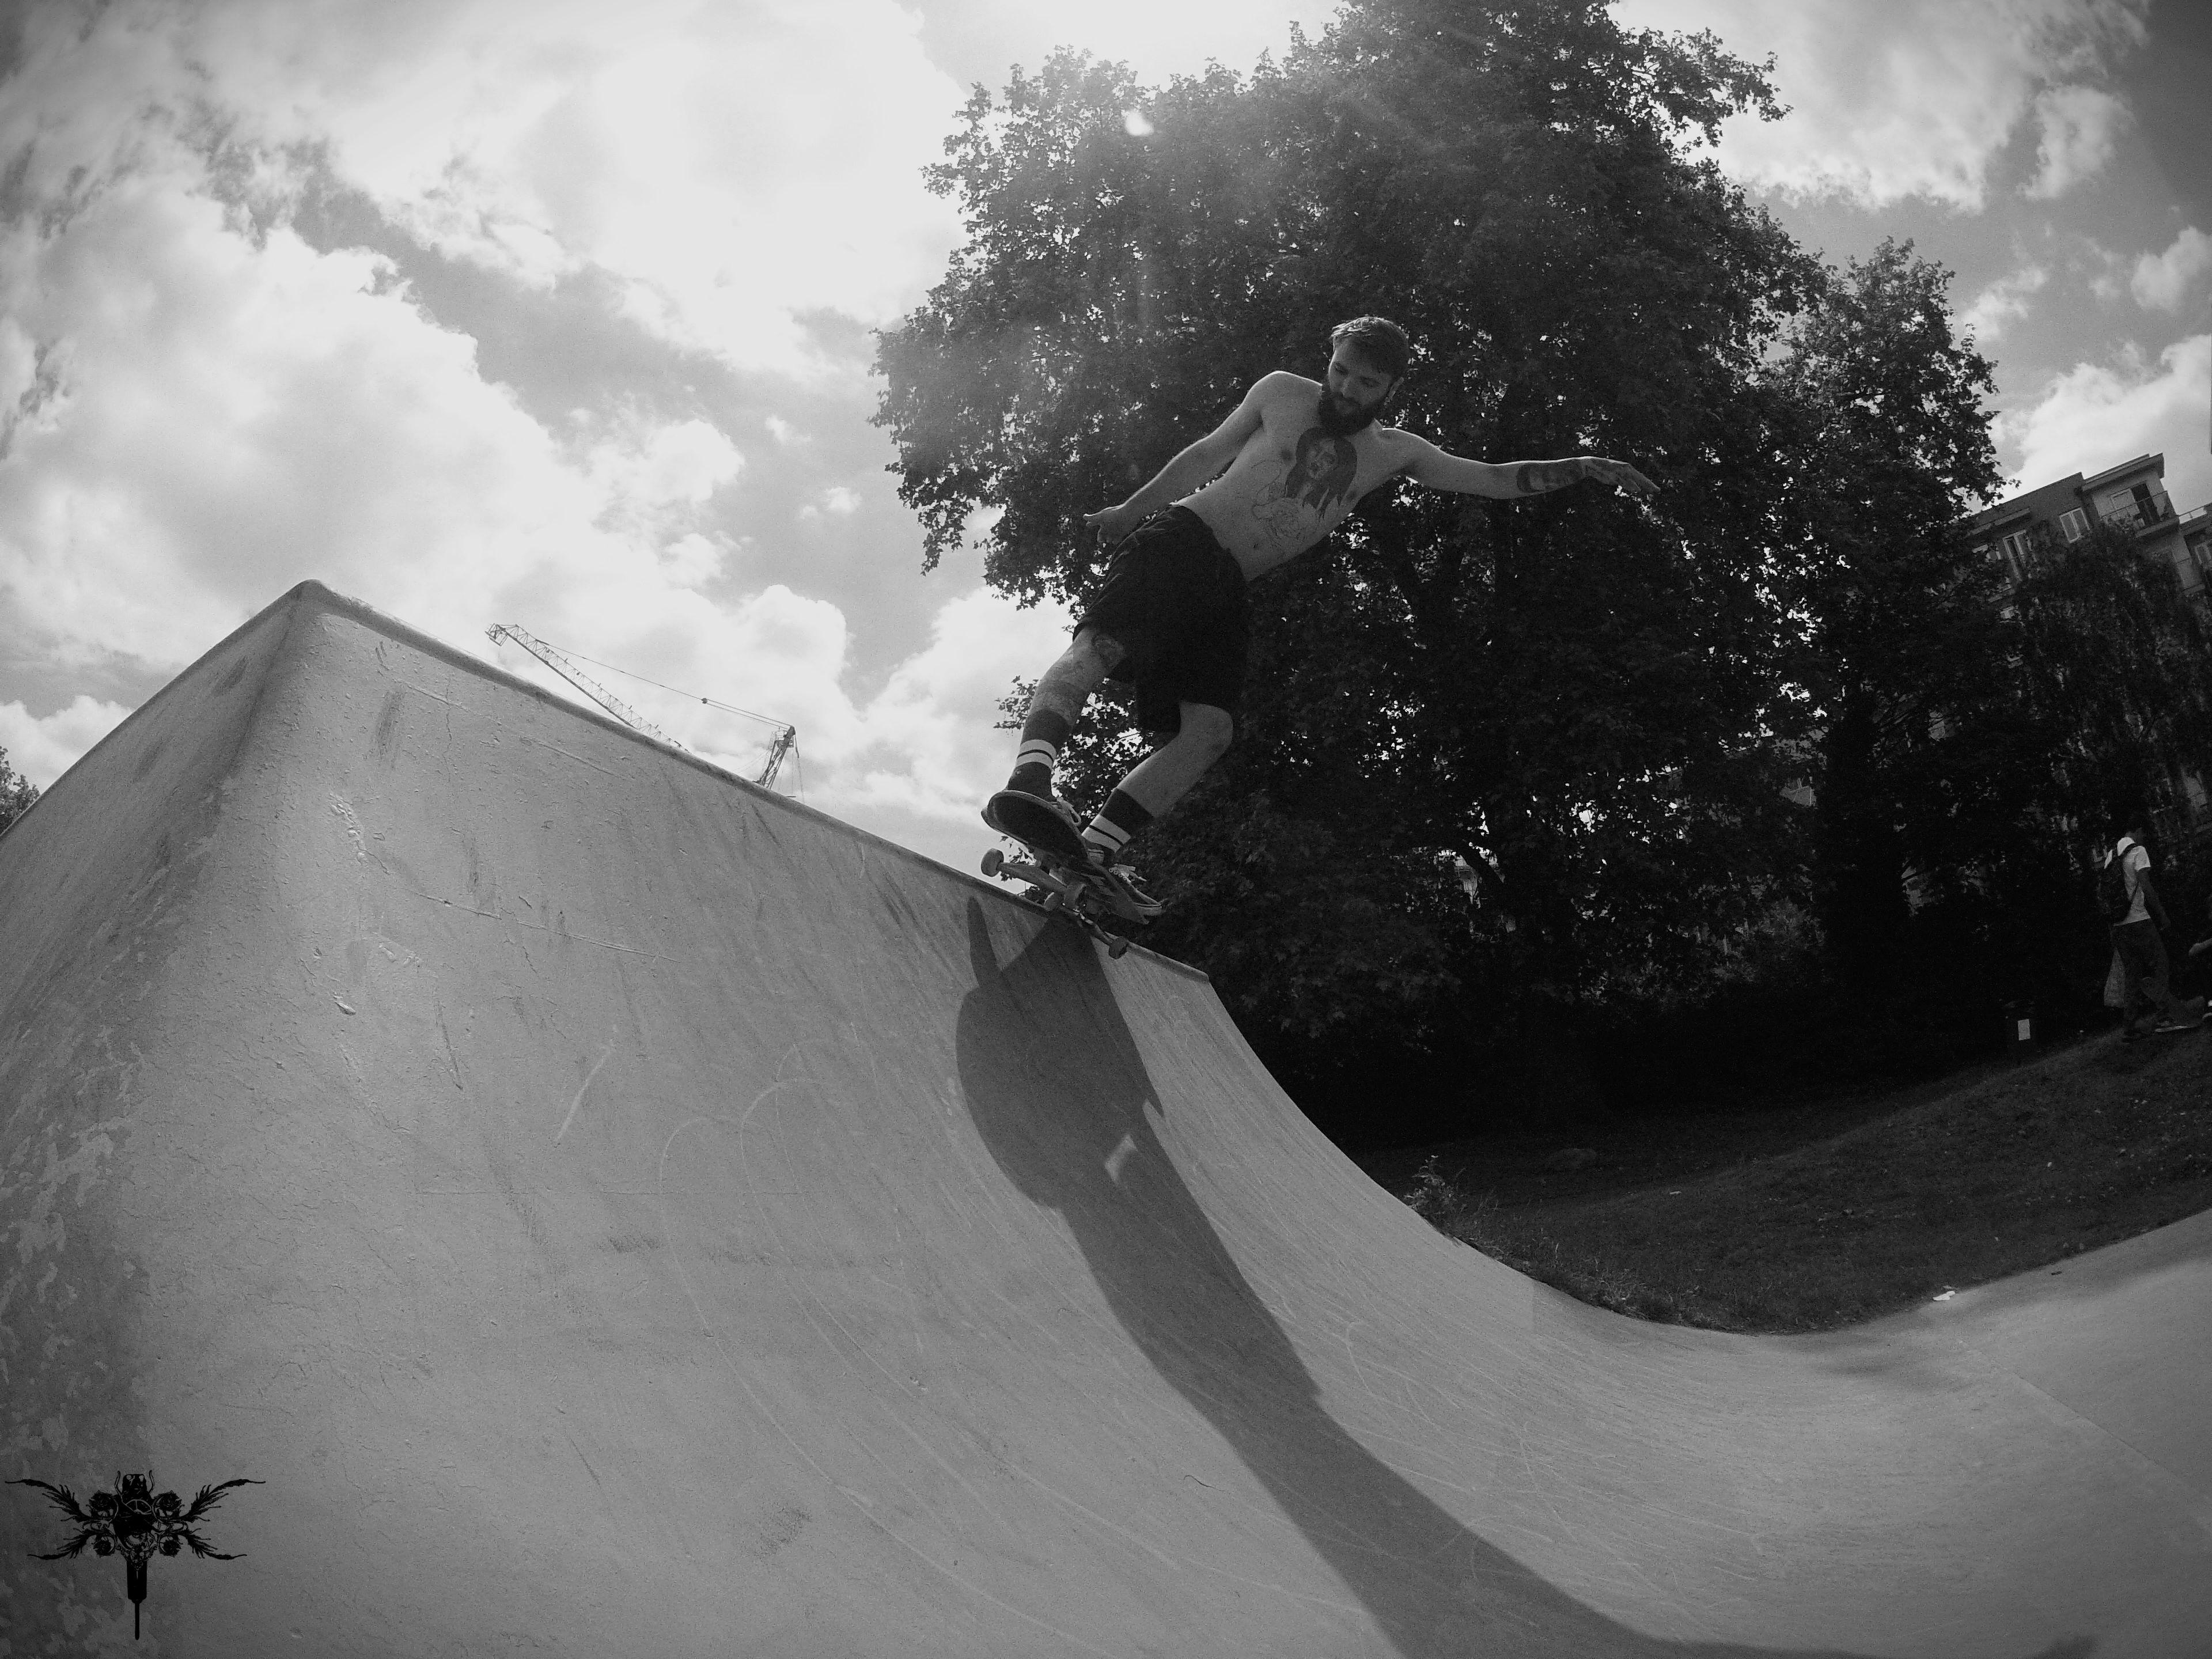 #skate #skateboard #smith #dark #fiend #fiendowned #wandleskatpark #wandle #skate #park #daniel #barreto #danielbarreto